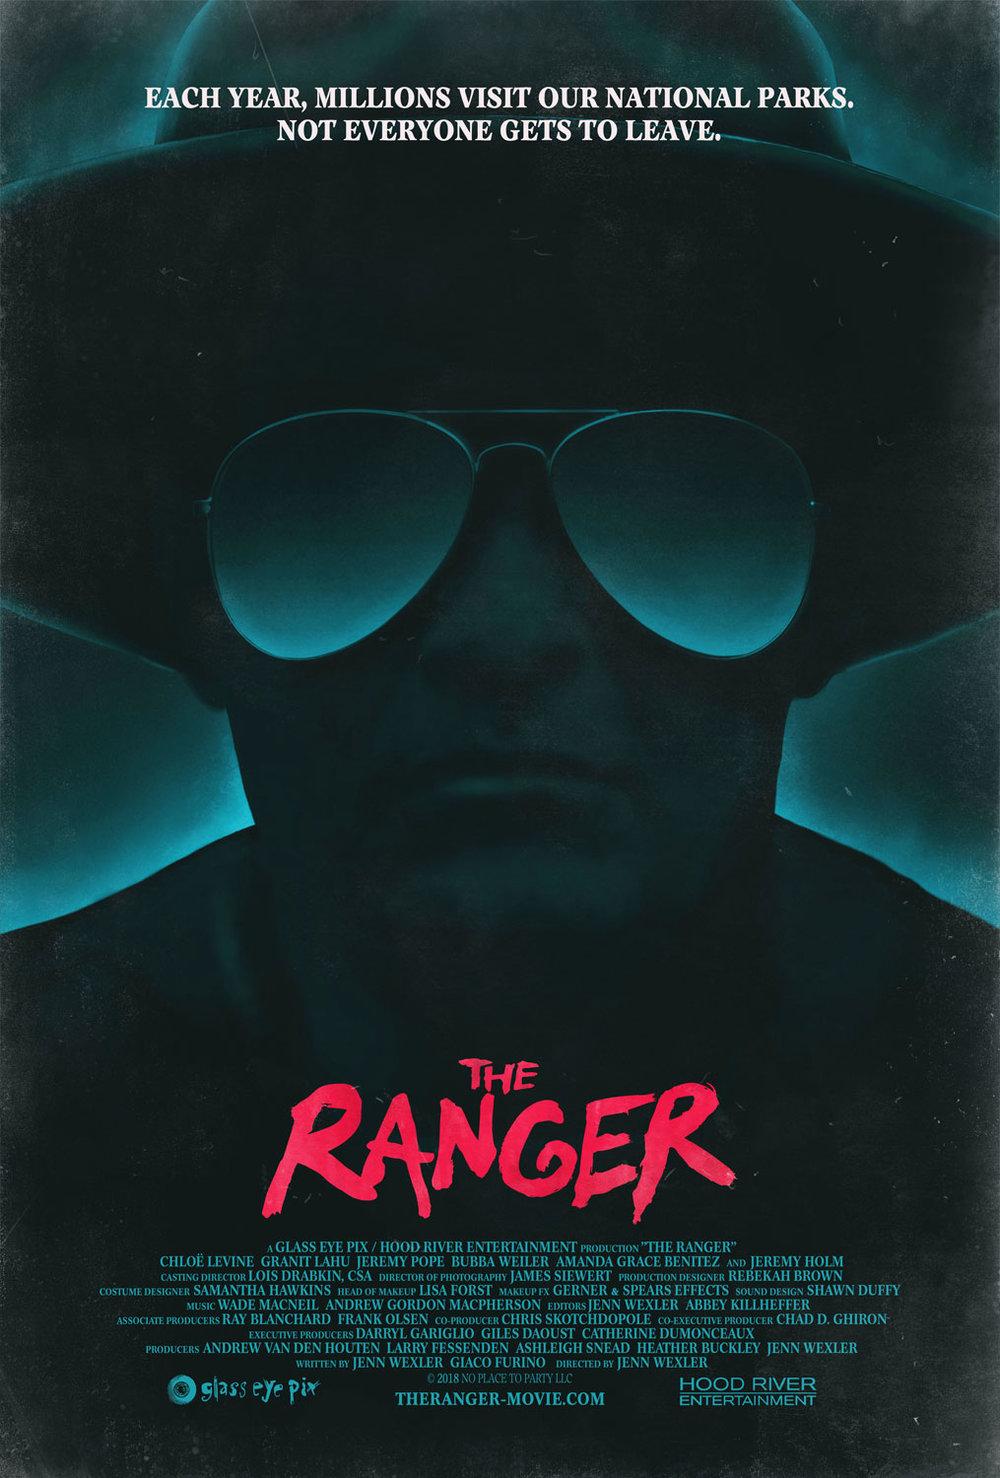 79thbroadway_the_ranger_movie_poster.jpg